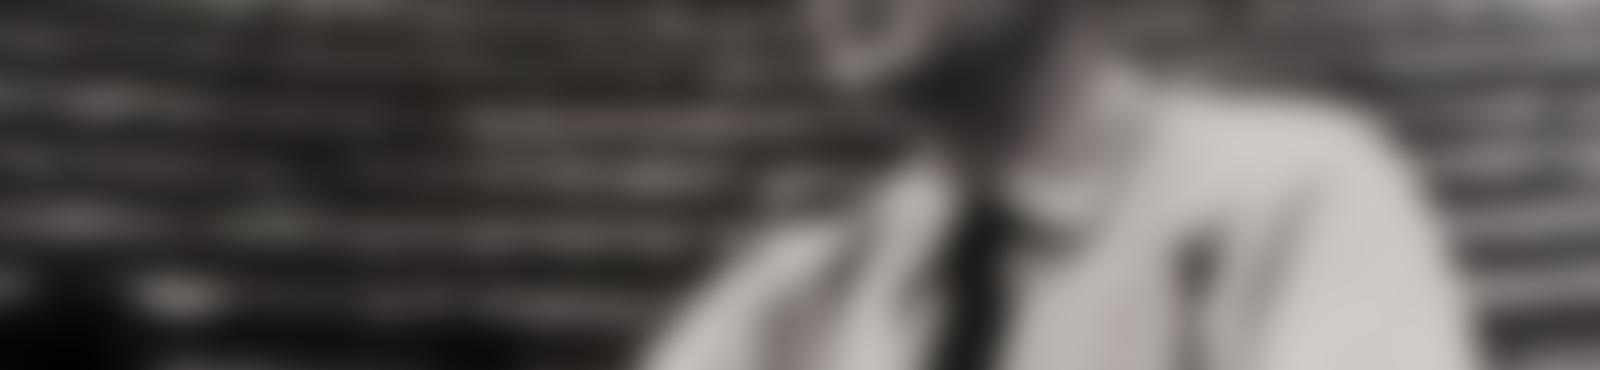 Blurred 8f6ab440 15b8 4c55 9adf 17d3e4f918d9